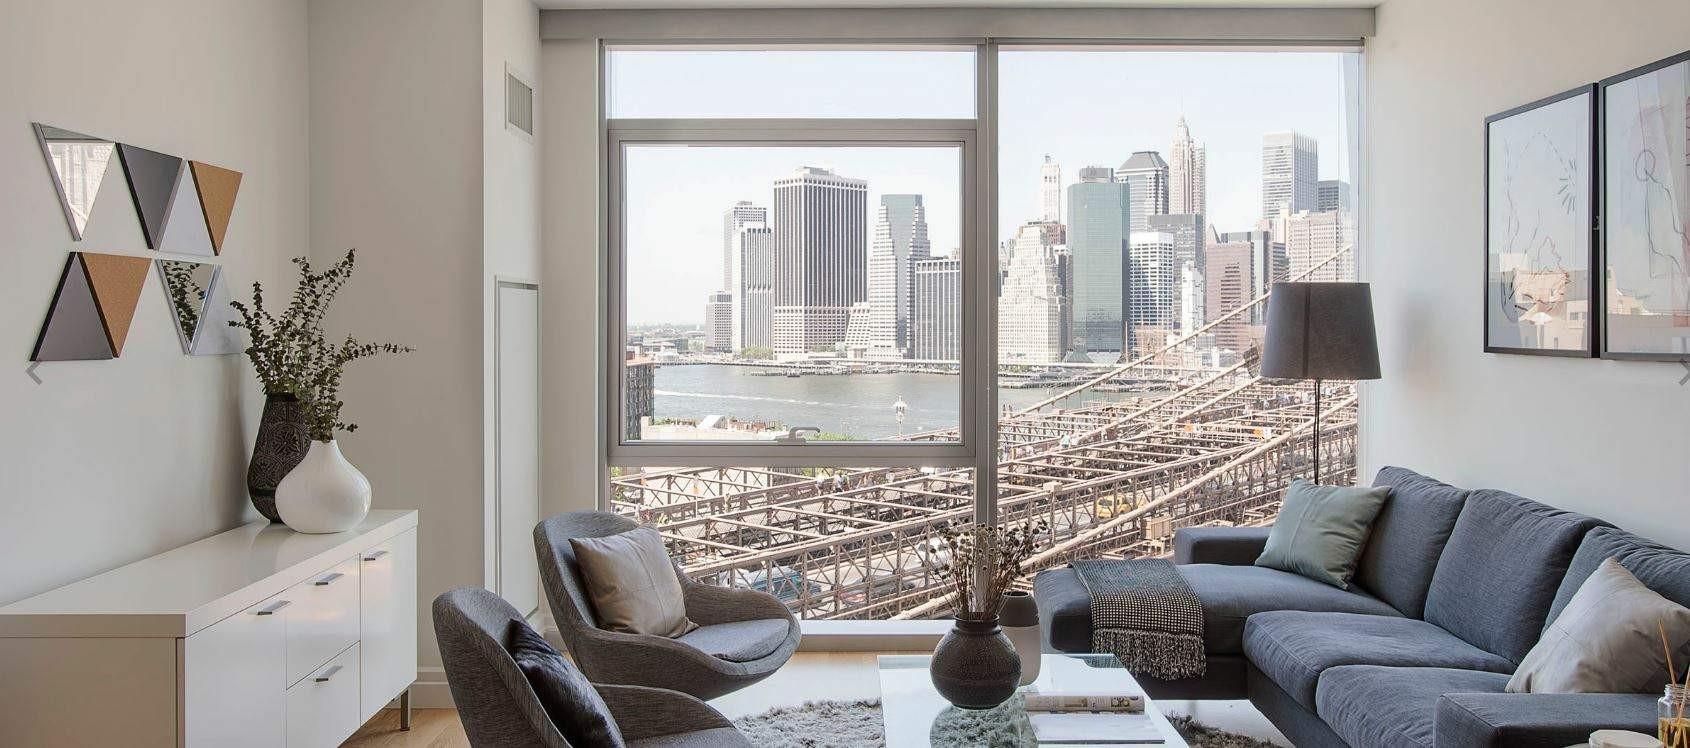 200 Water St #34R, New York, NY 10038 - Apartment Rental   PadMapper